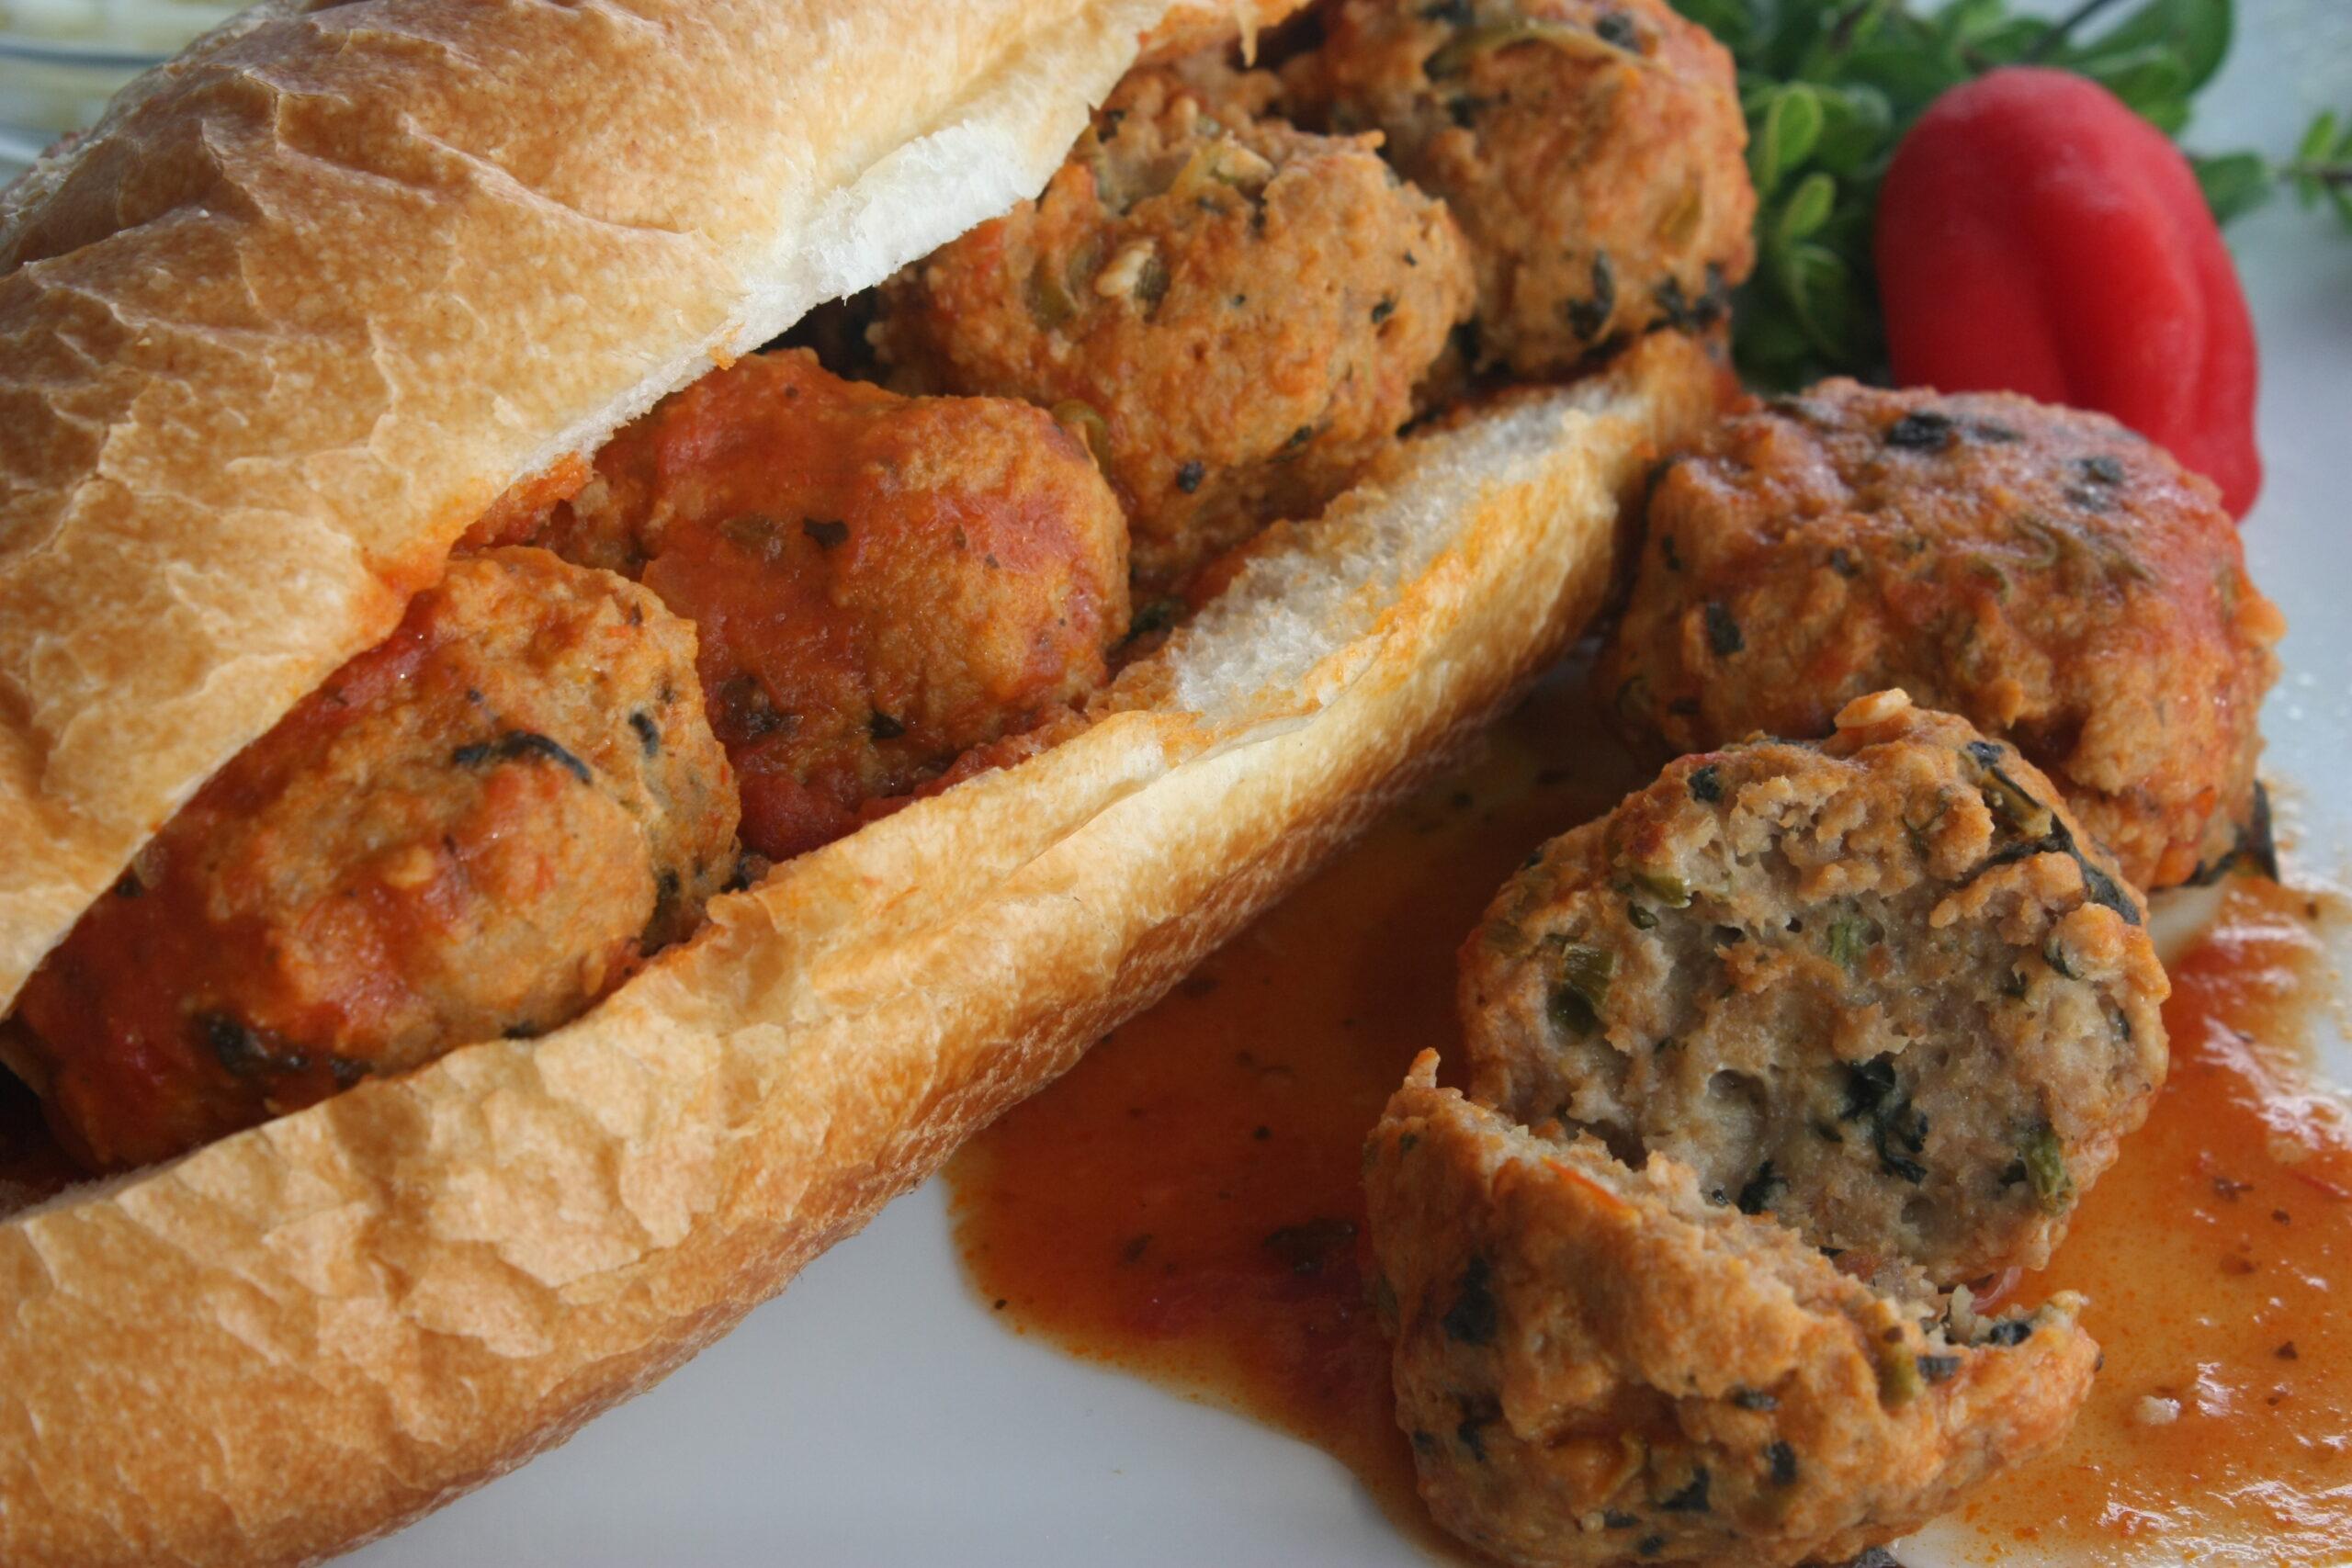 Recipes for Ground Turkey Meatballs